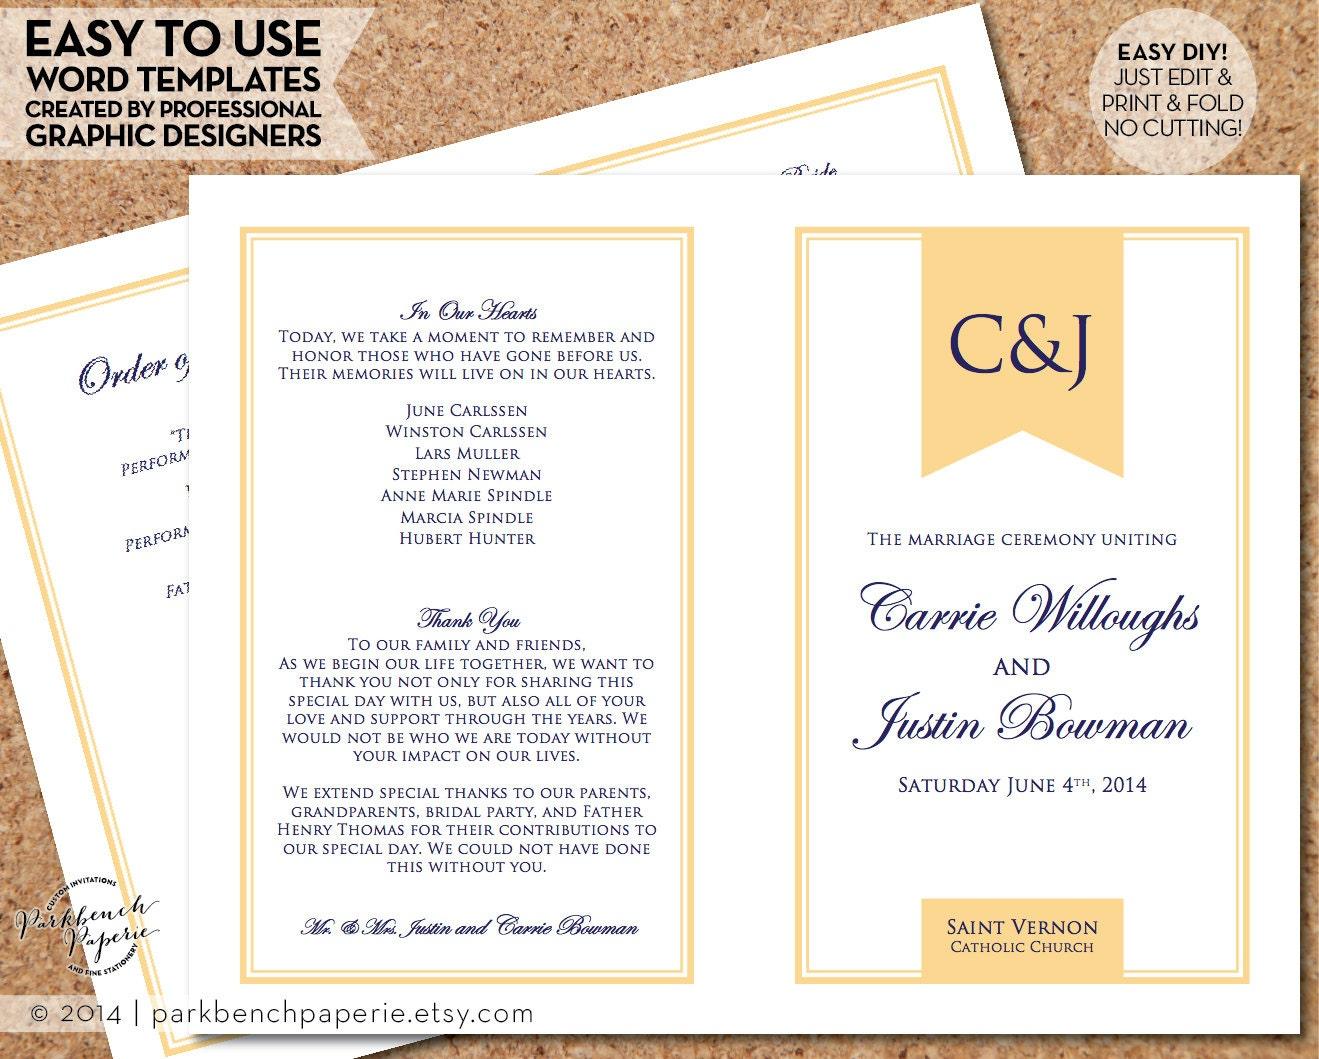 Diy Wedding Word Banners: Wedding Program Template Simple Banner Butter DIY